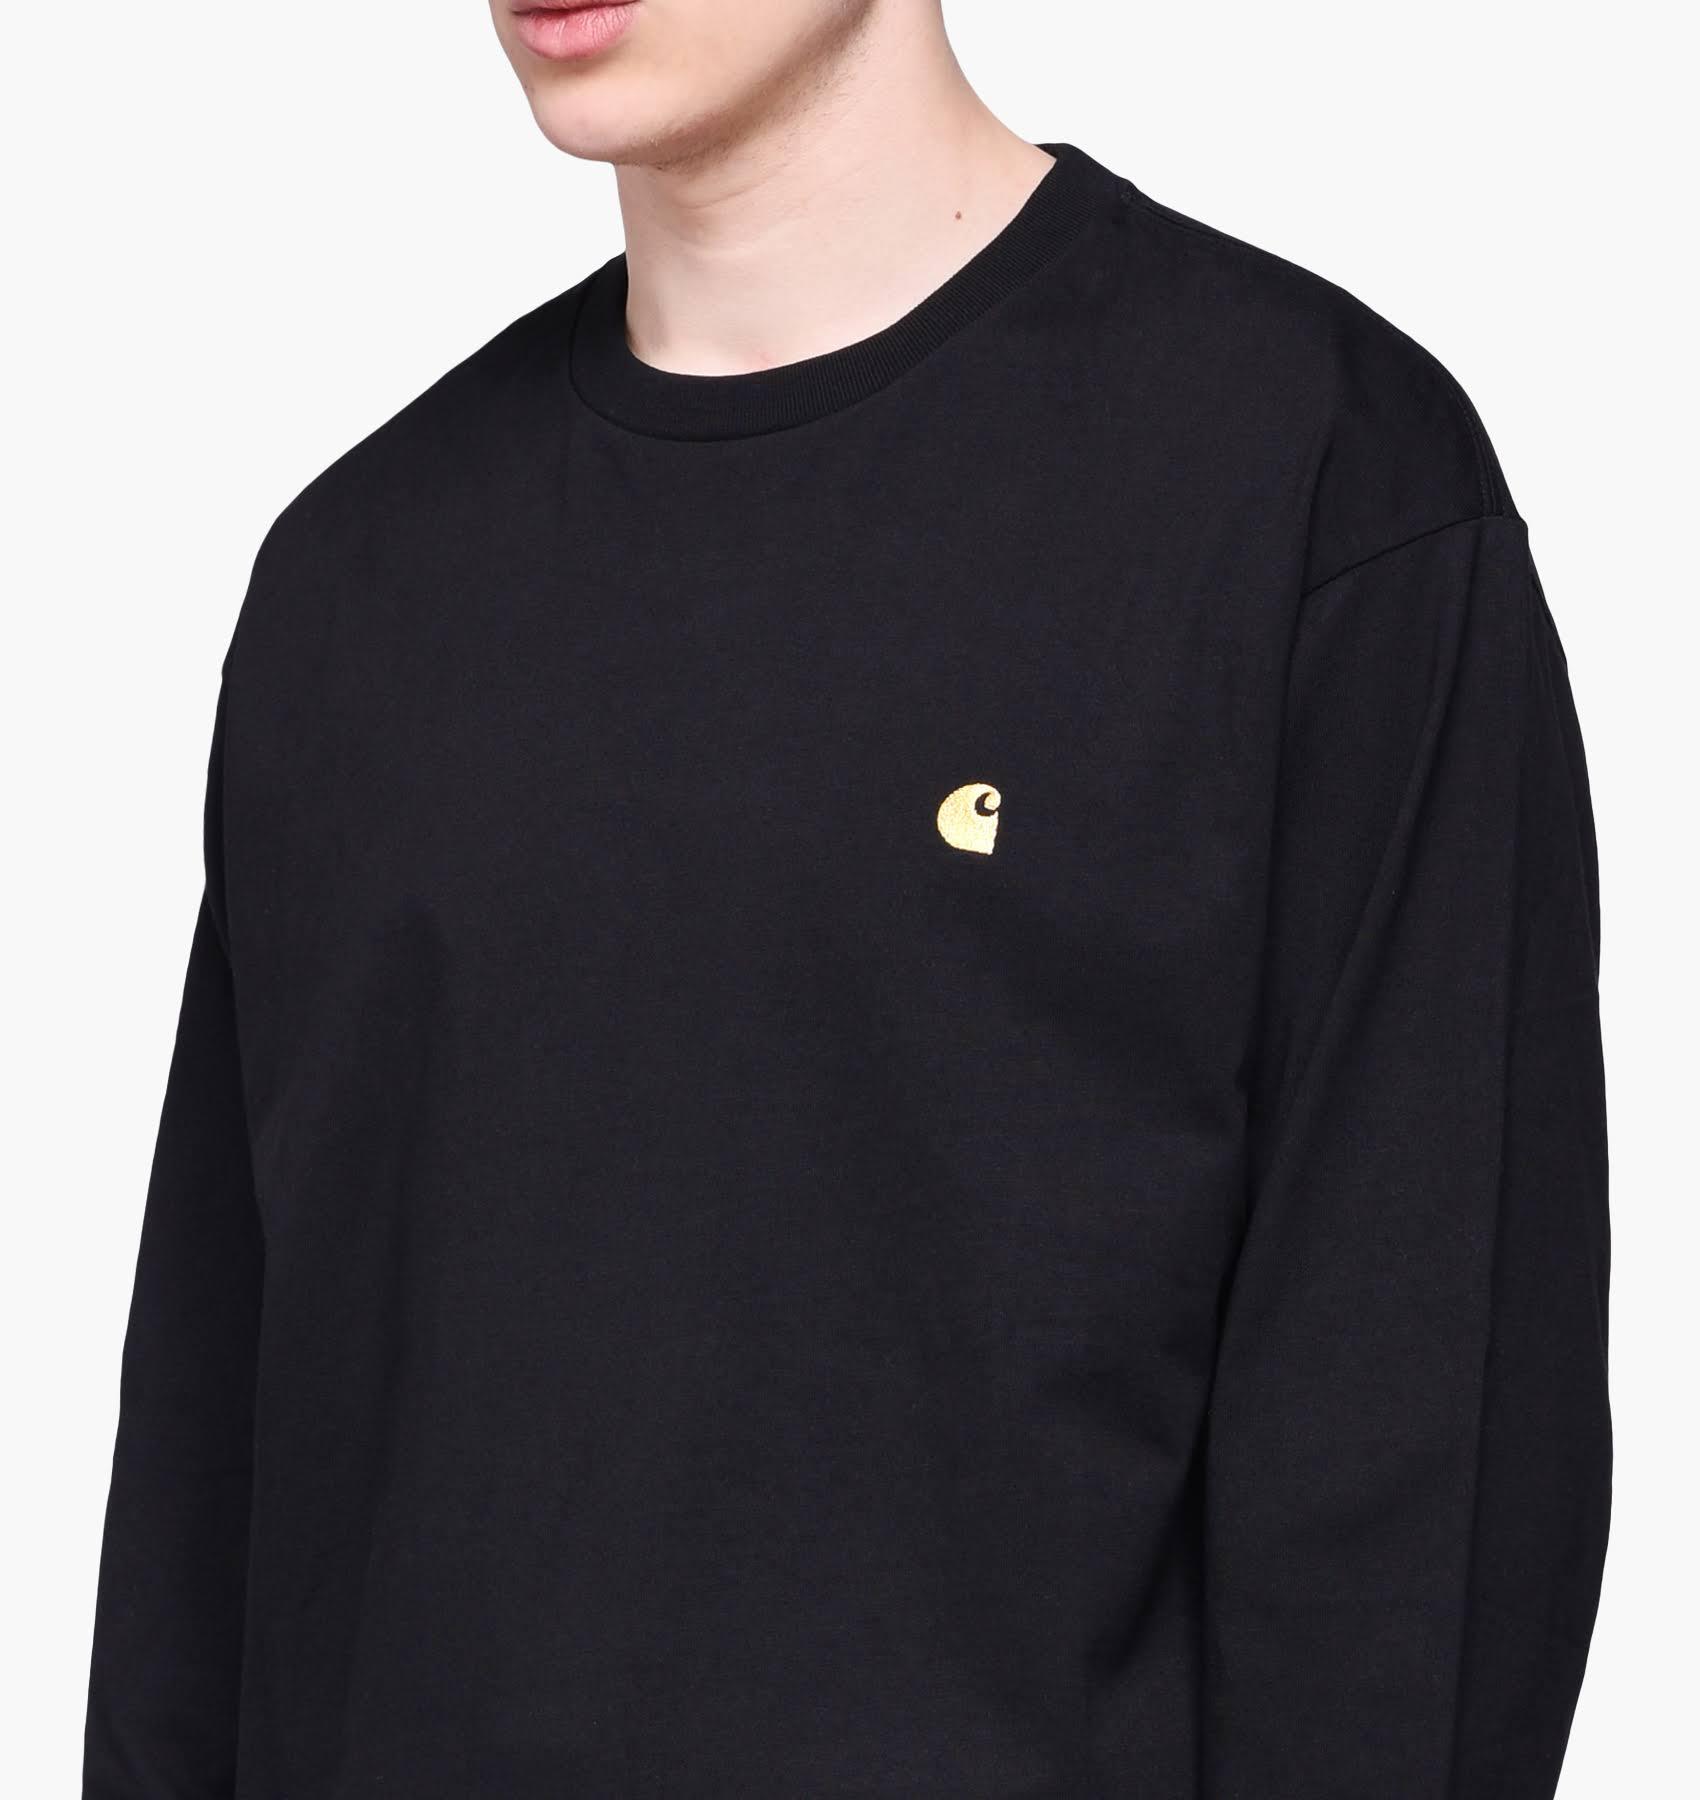 oronero maniche Sleeve maschili Long Tee T lunghe CarharttChase Xs Black shirt 6gv7yIbfYm